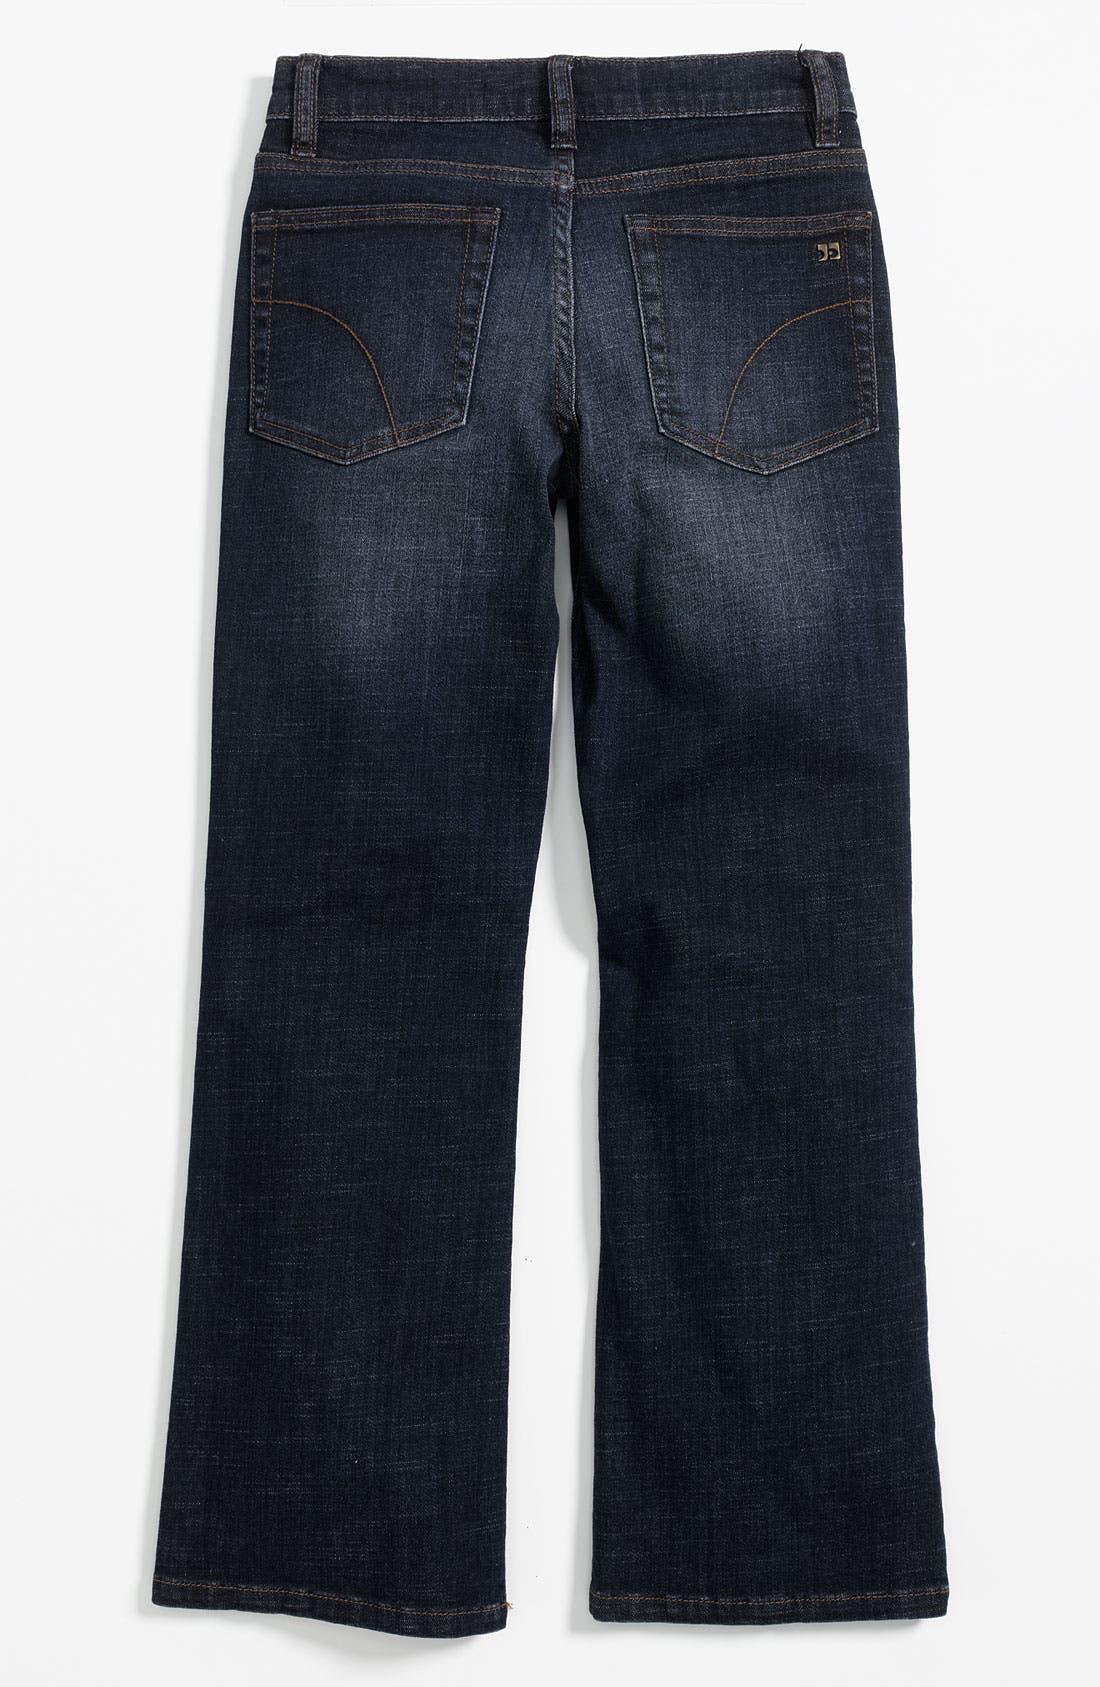 Alternate Image 1 Selected - Joe's 'Rebel' Jeans (Big Boys)